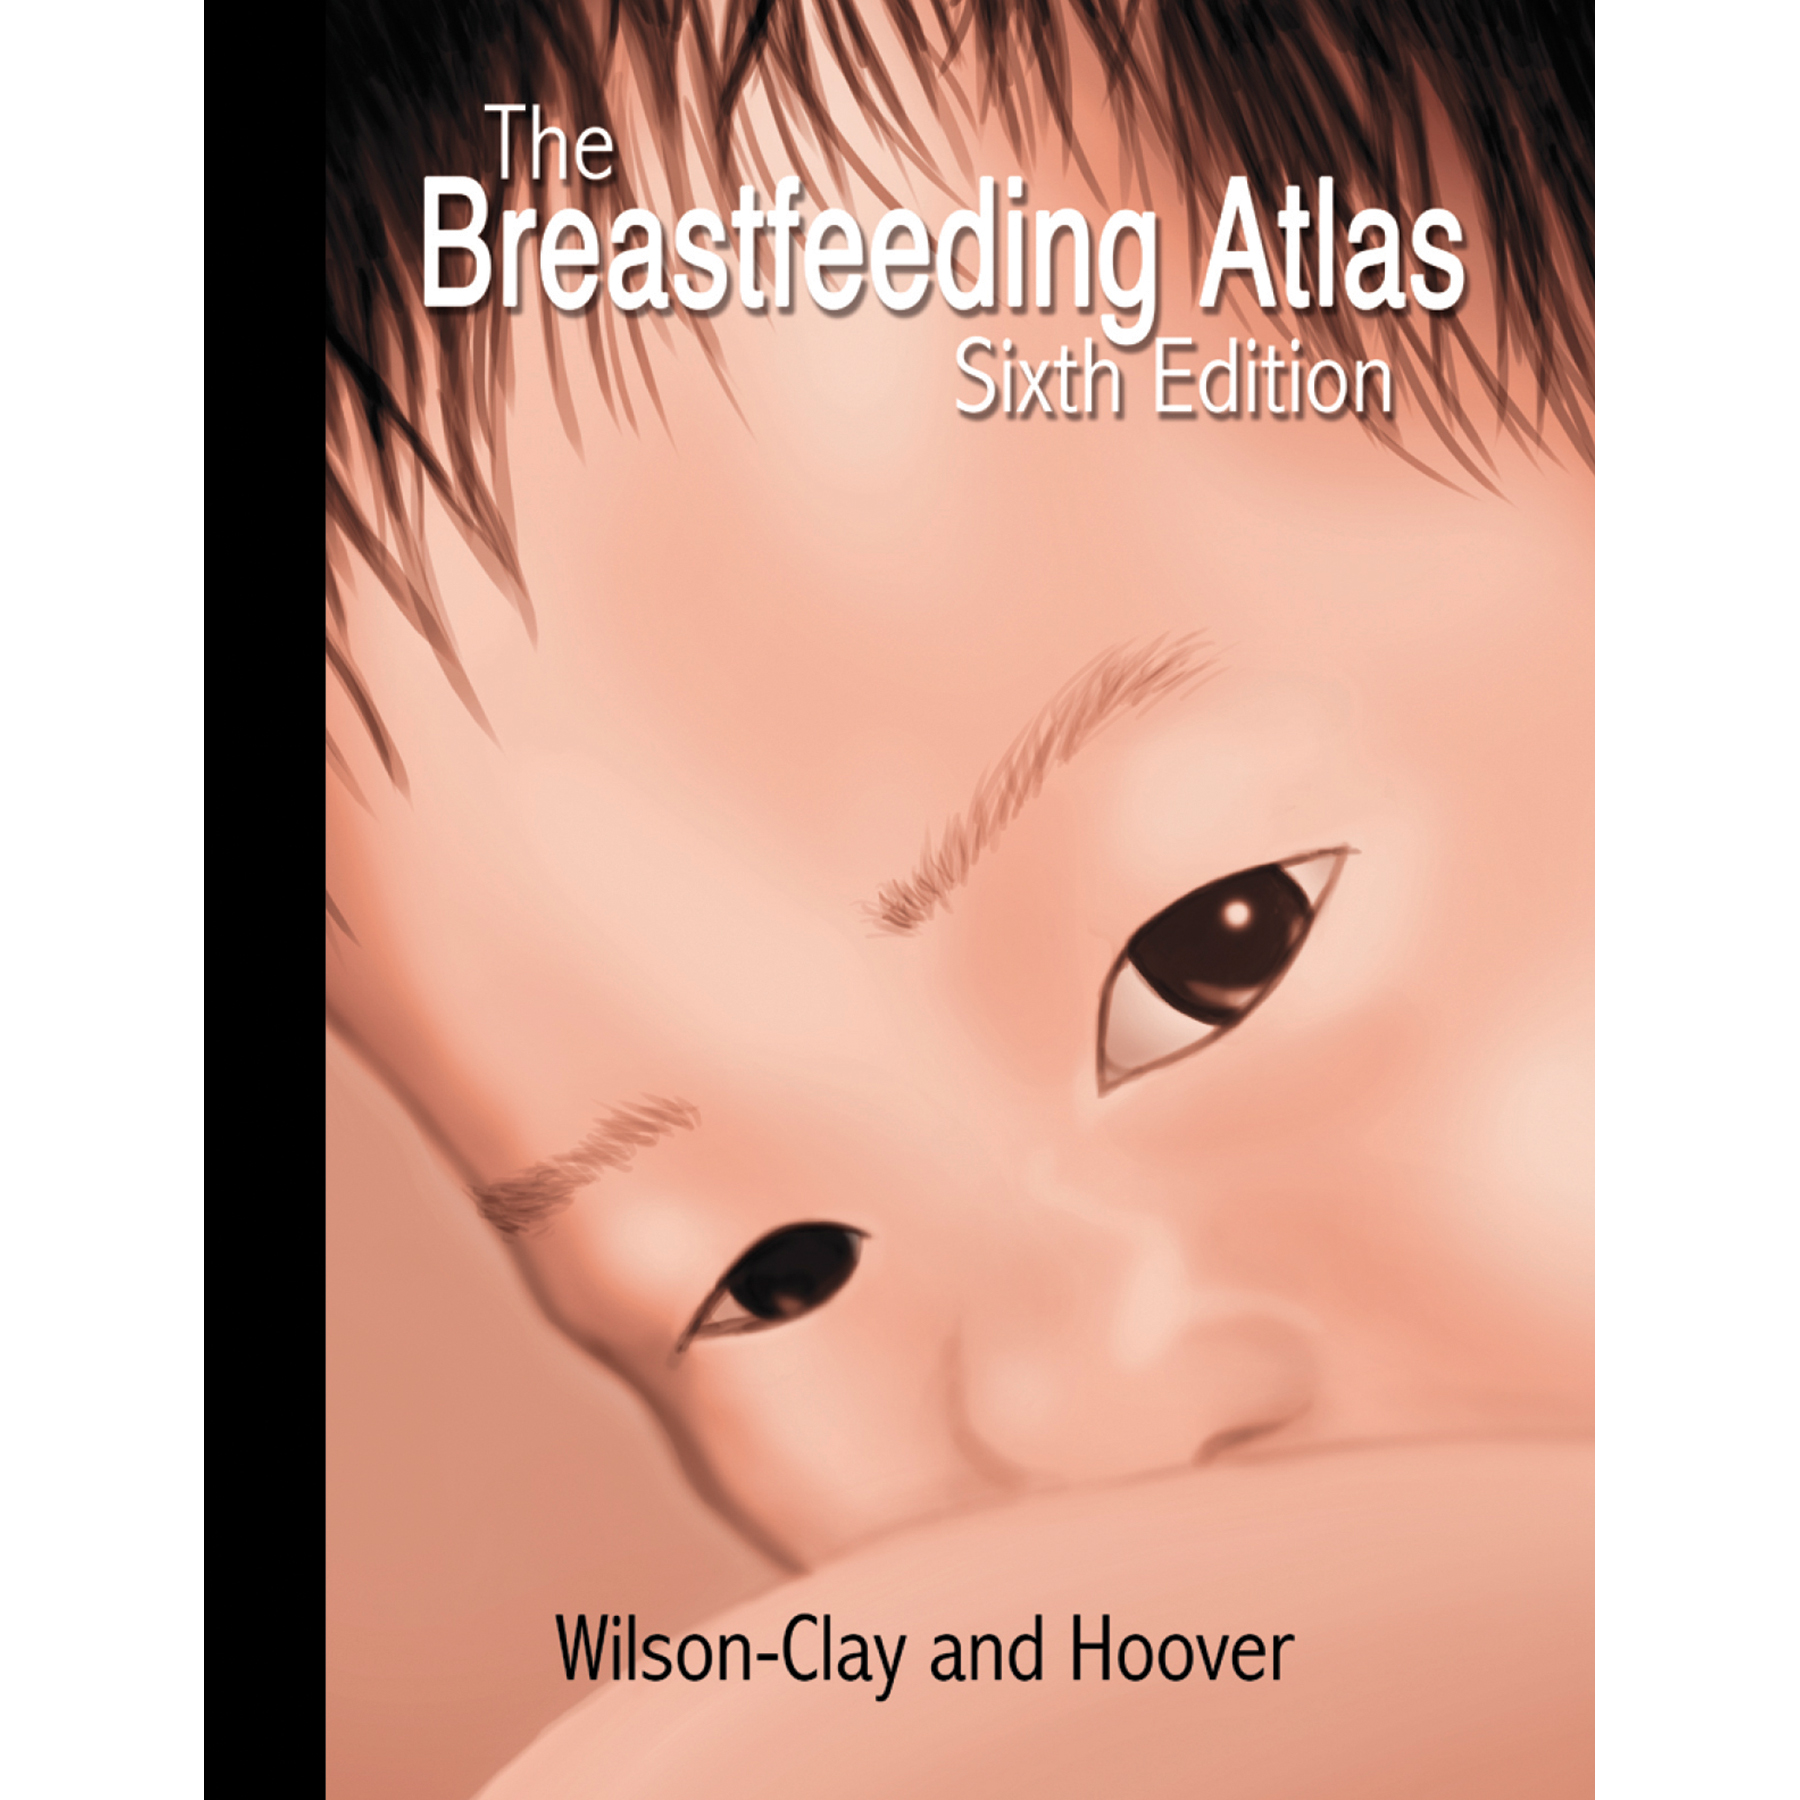 The Breastfeeding Atlas Book 6th edition, closeup image of Asian baby breastfeeding, 400 photos, Childbirth Graphics, 50021